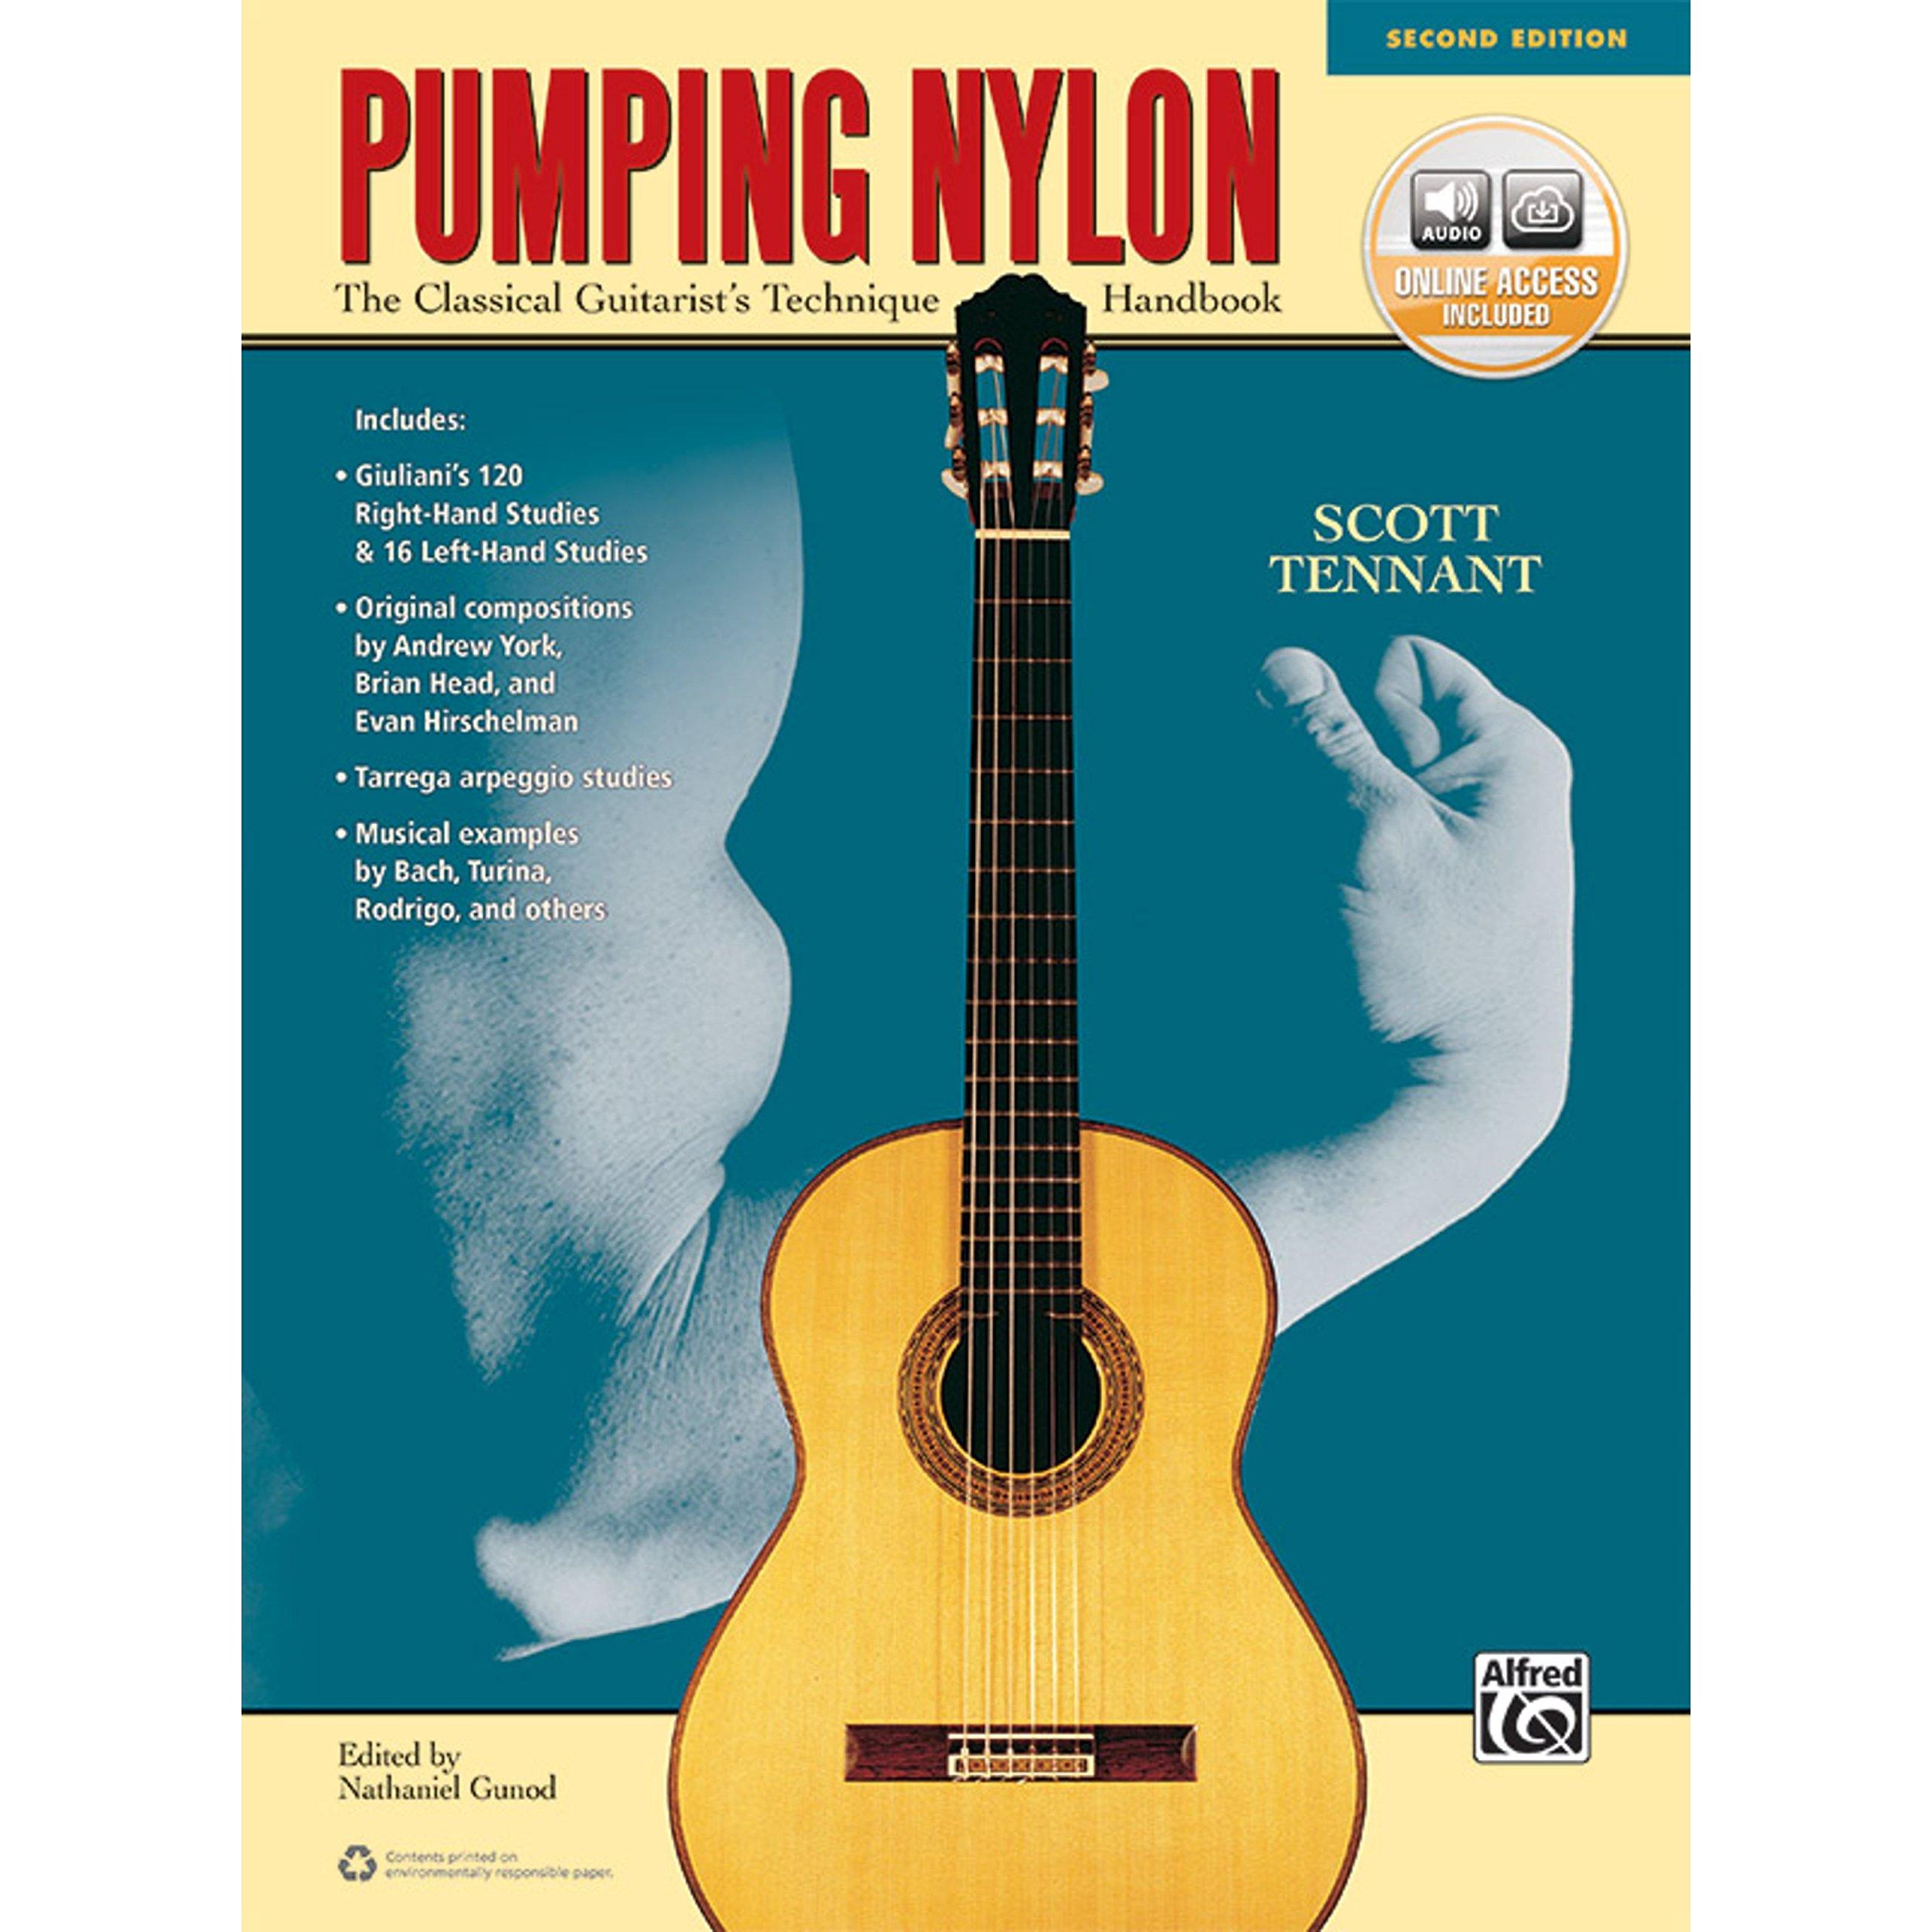 Pumping Nylon  2nd Edition